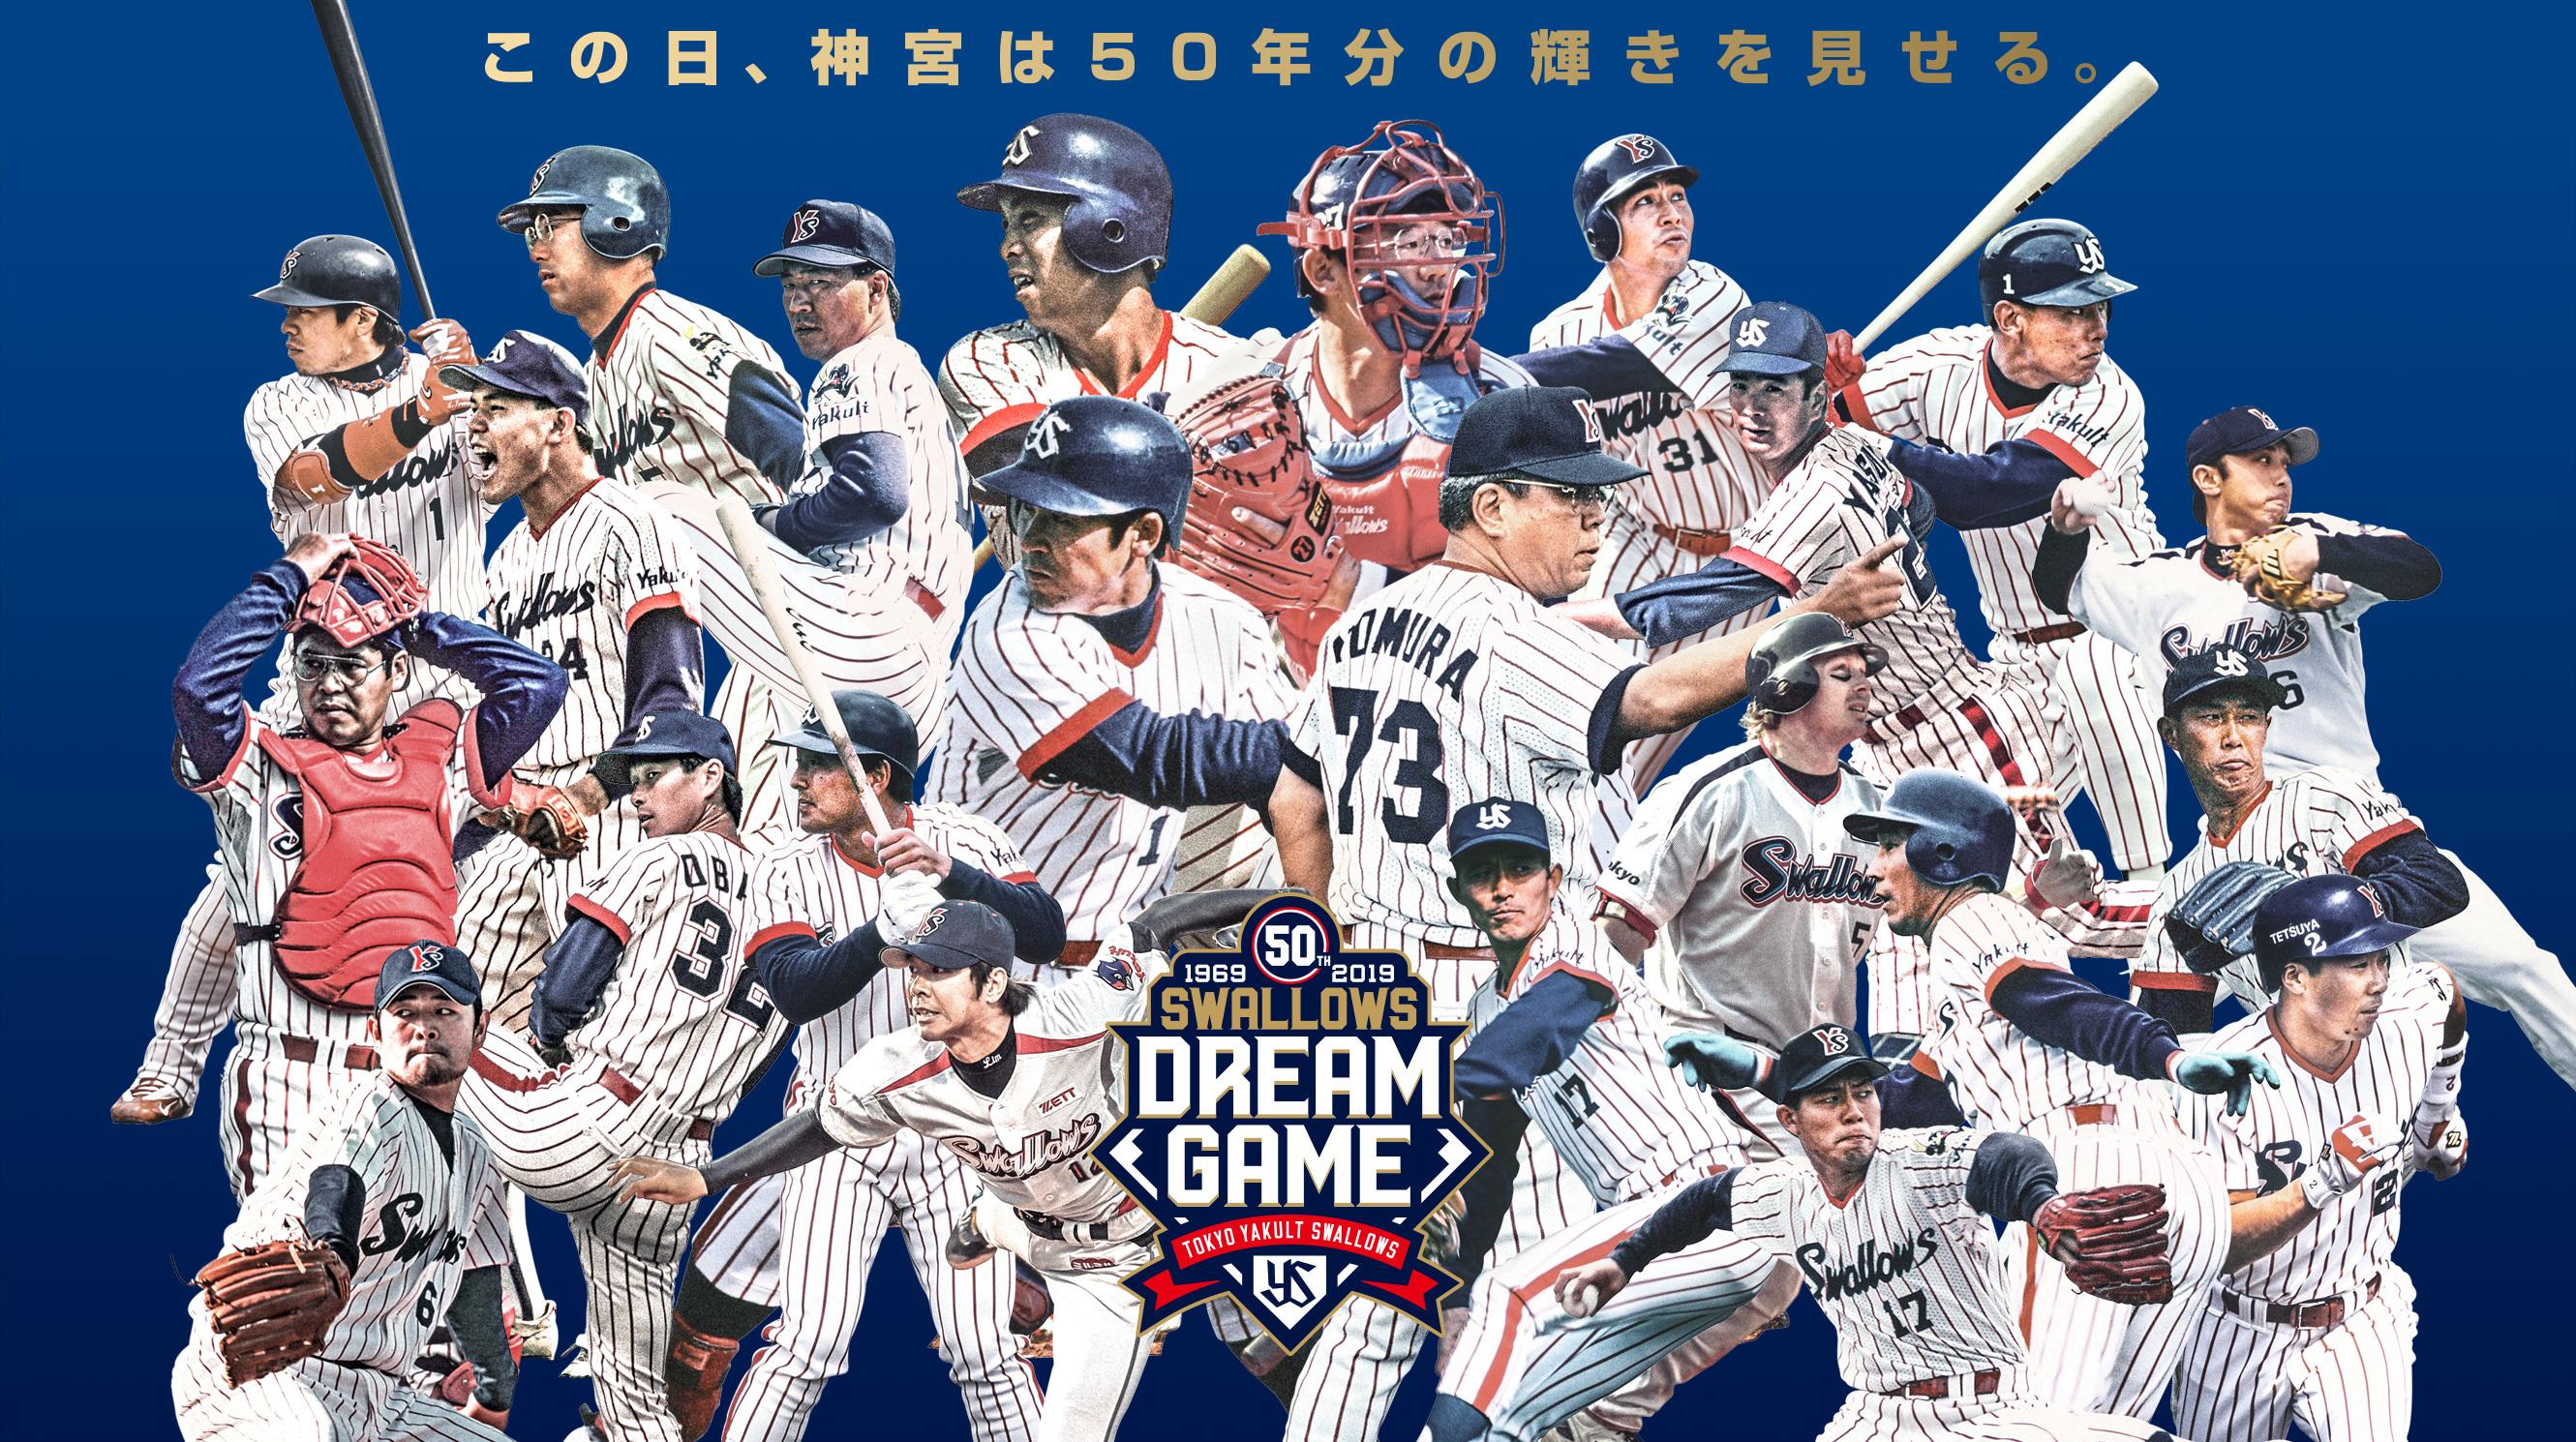 『Swallows DREAM GAME』が7月11日(木)に開催。明治神宮野球場に往年の名選手が集う